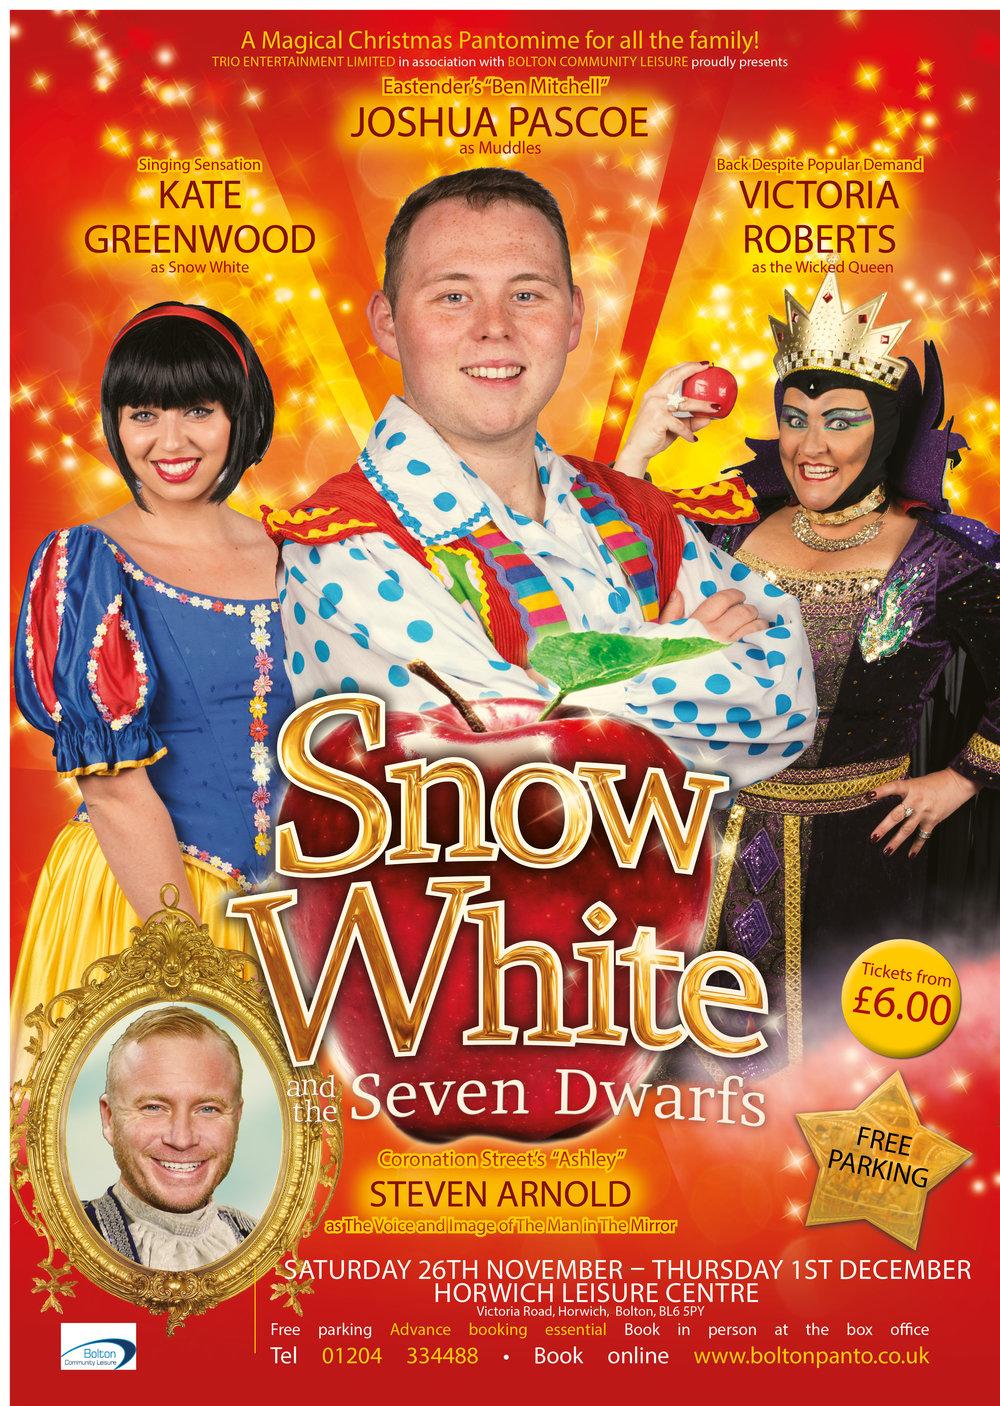 Snow White Horwich front Jpeg.jpg